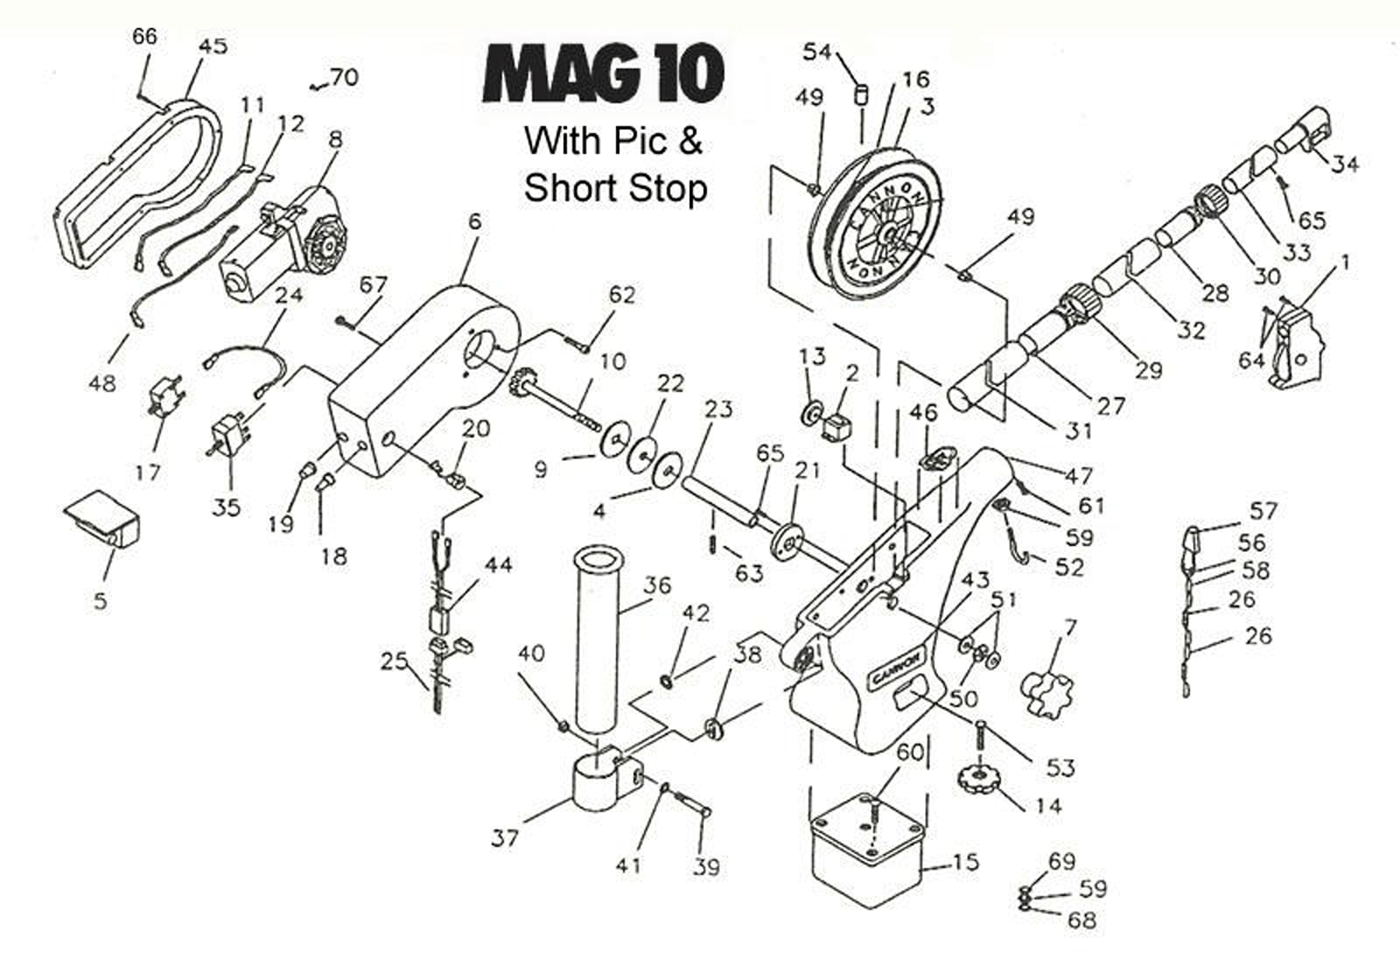 Order Cannon Mag 10 Pre Models Electric Downrigger